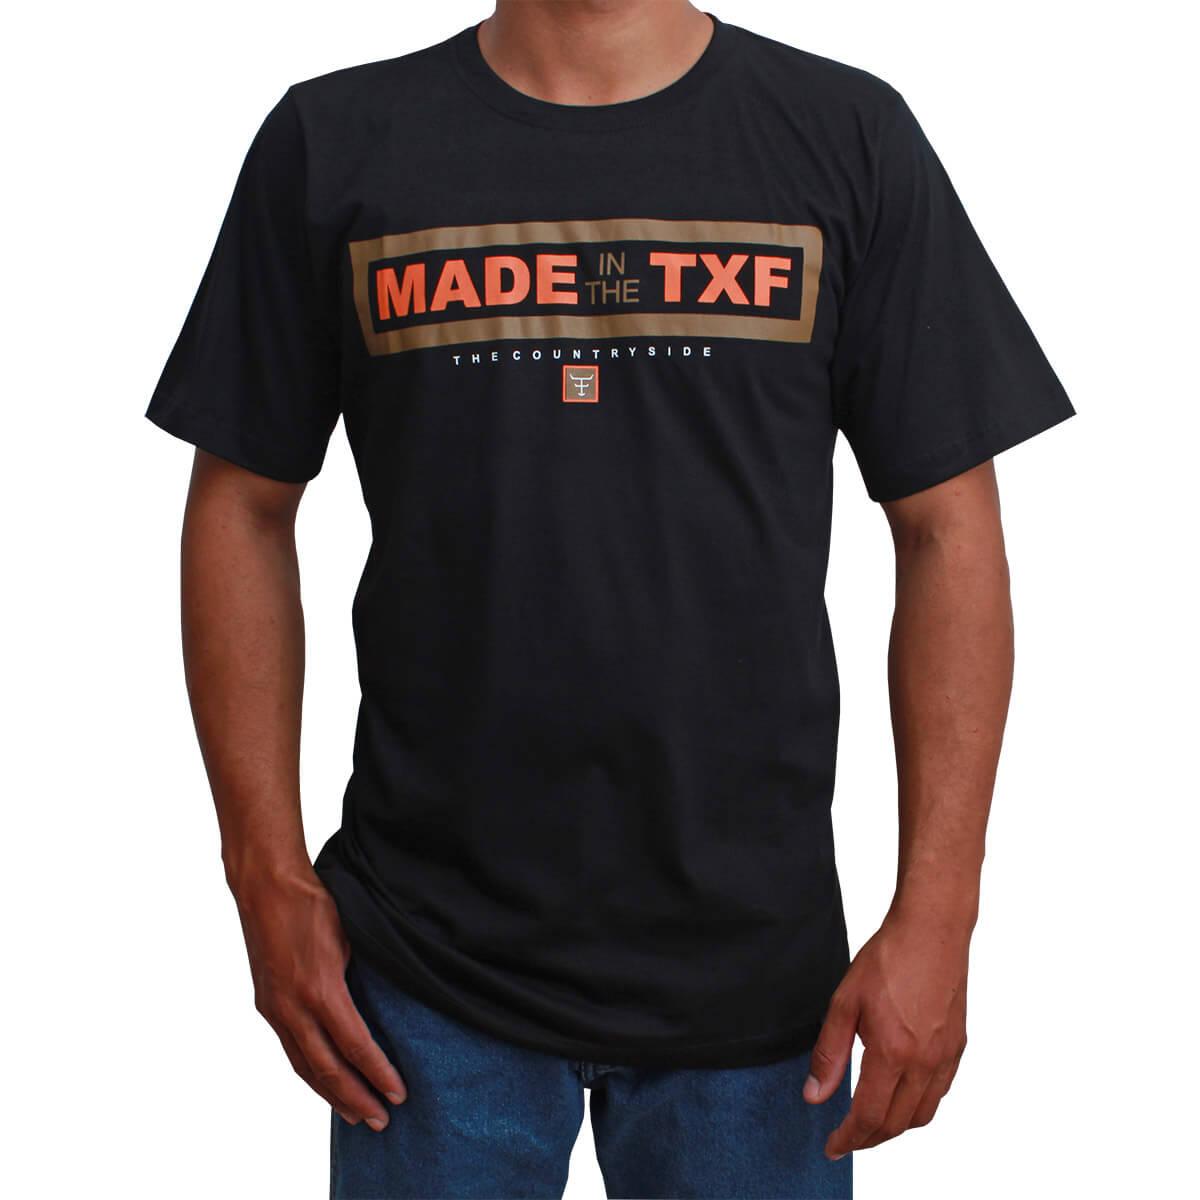 Camiseta Masculina Texas Farm Preta Made In The TXF